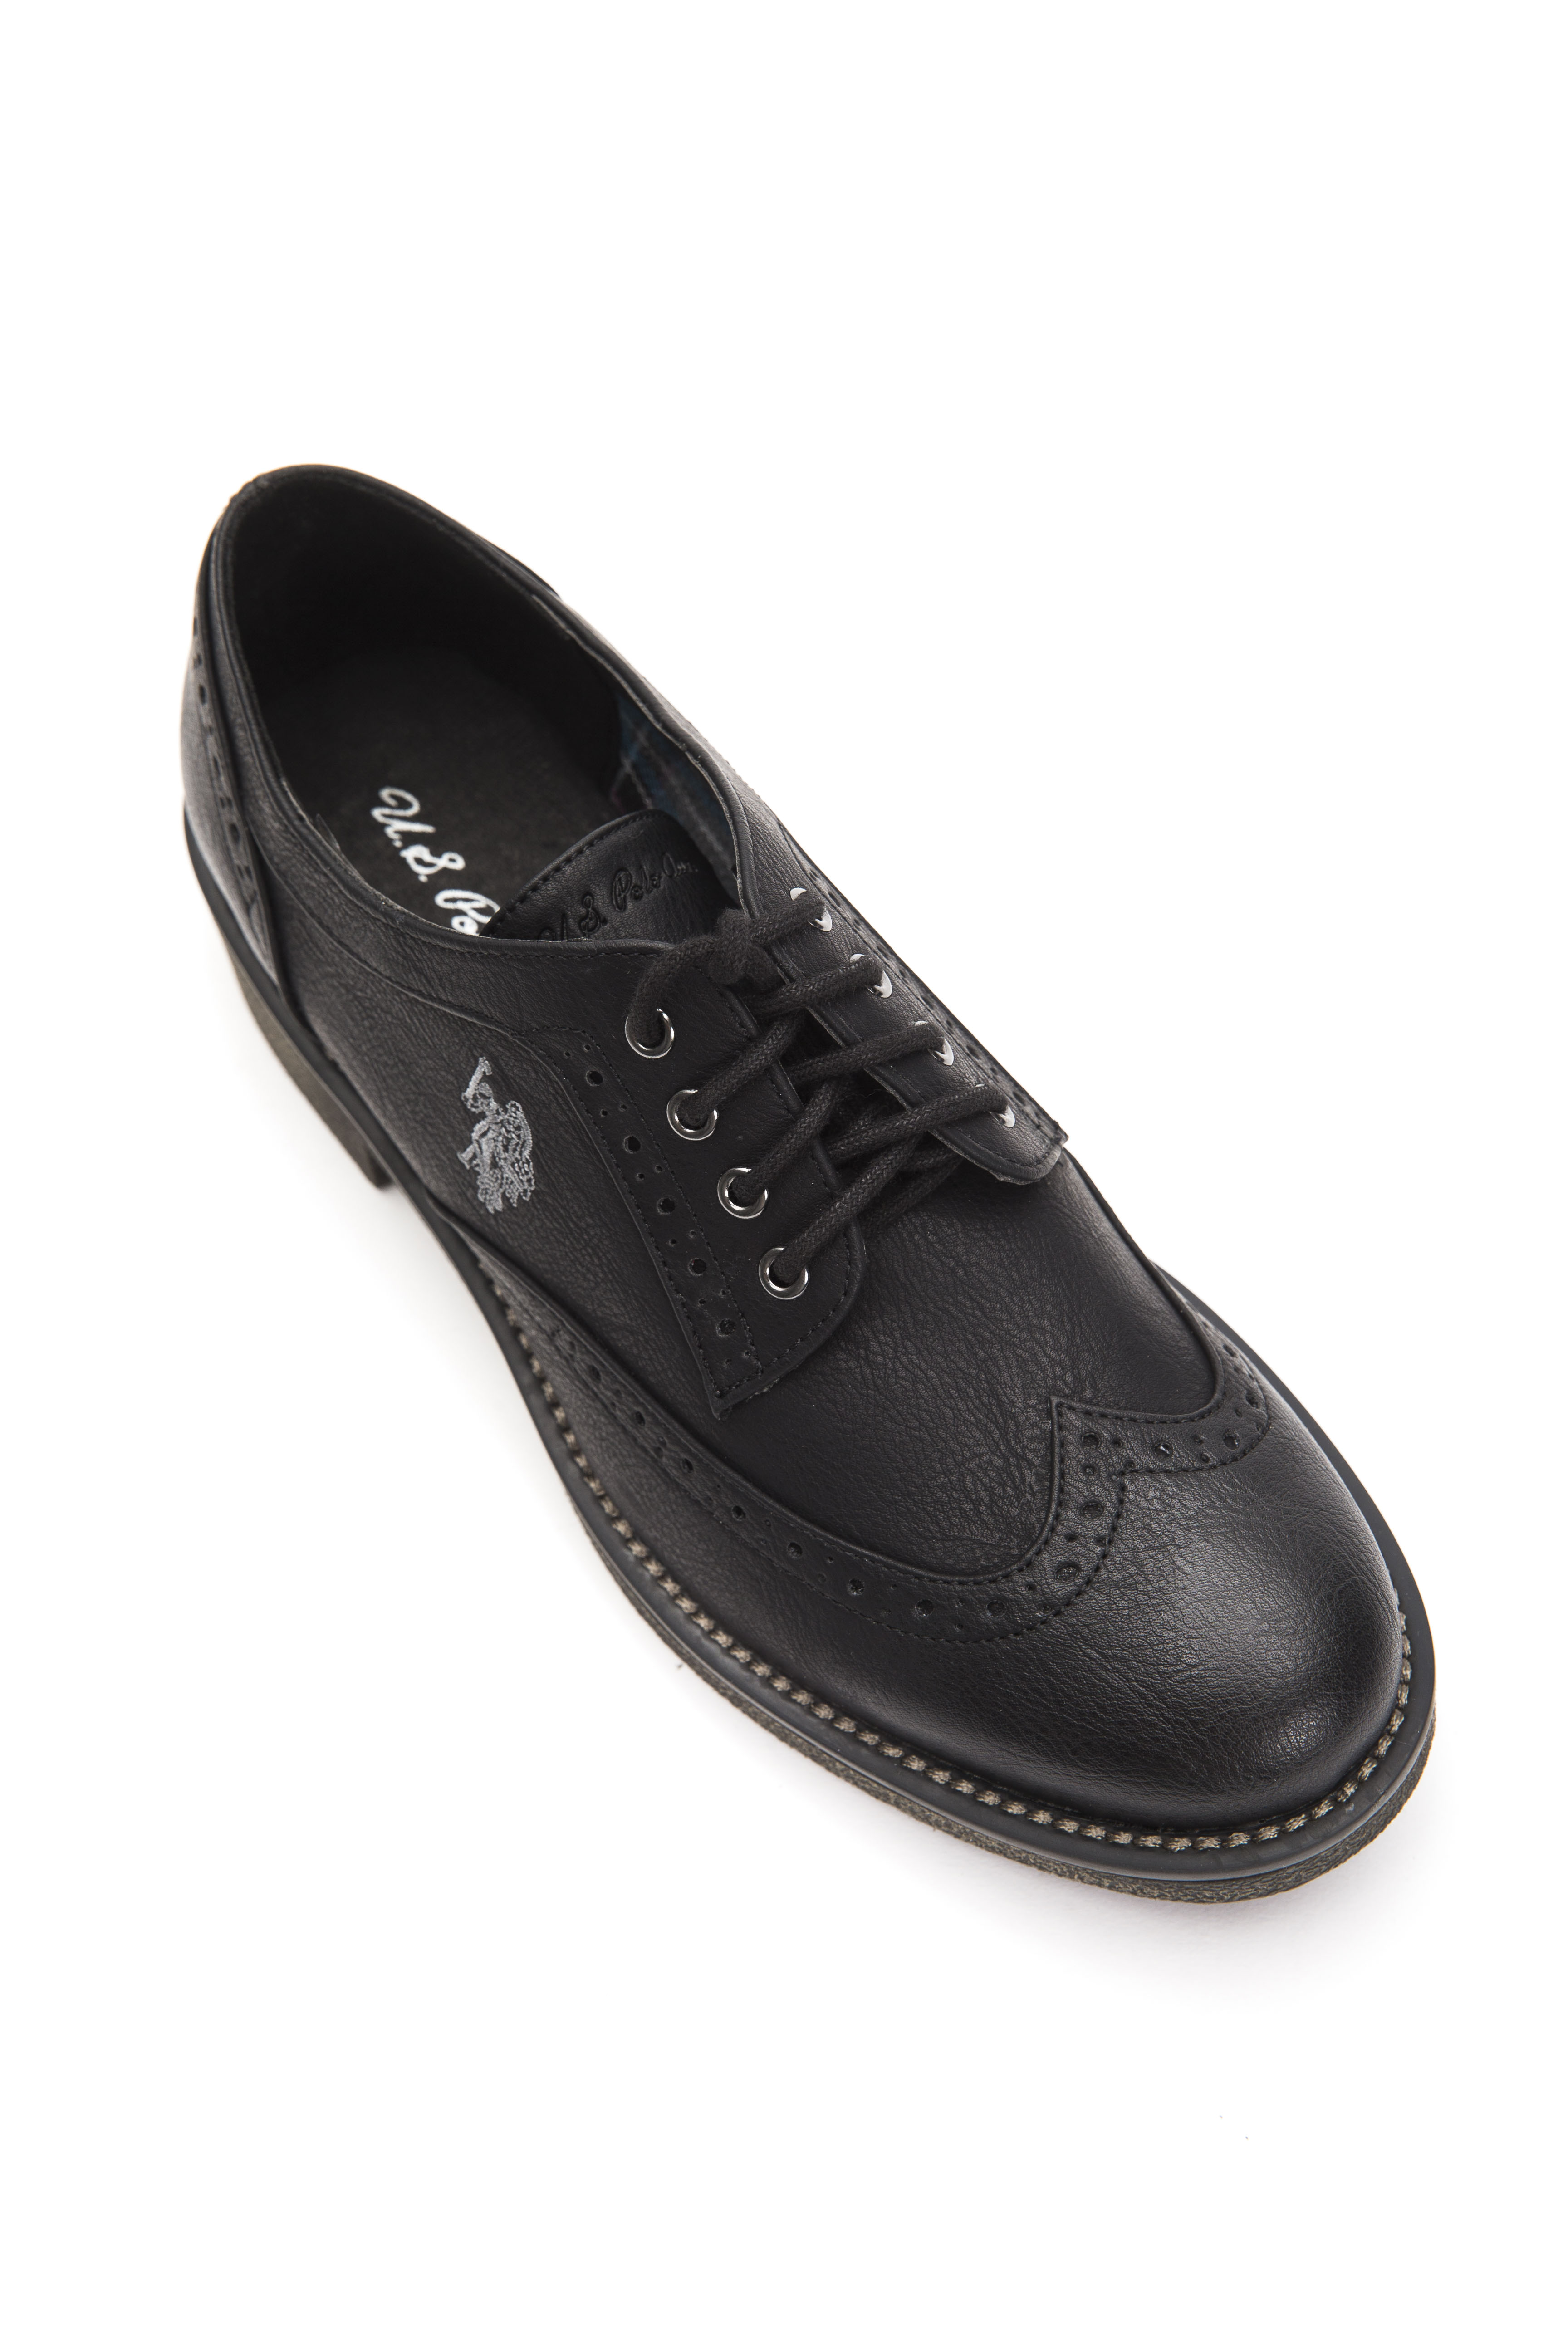 Us Noir Polo Noir Polo Seraphin Chaussures Chaussures Chaussures Us Seraphin jGzMVLUpqS